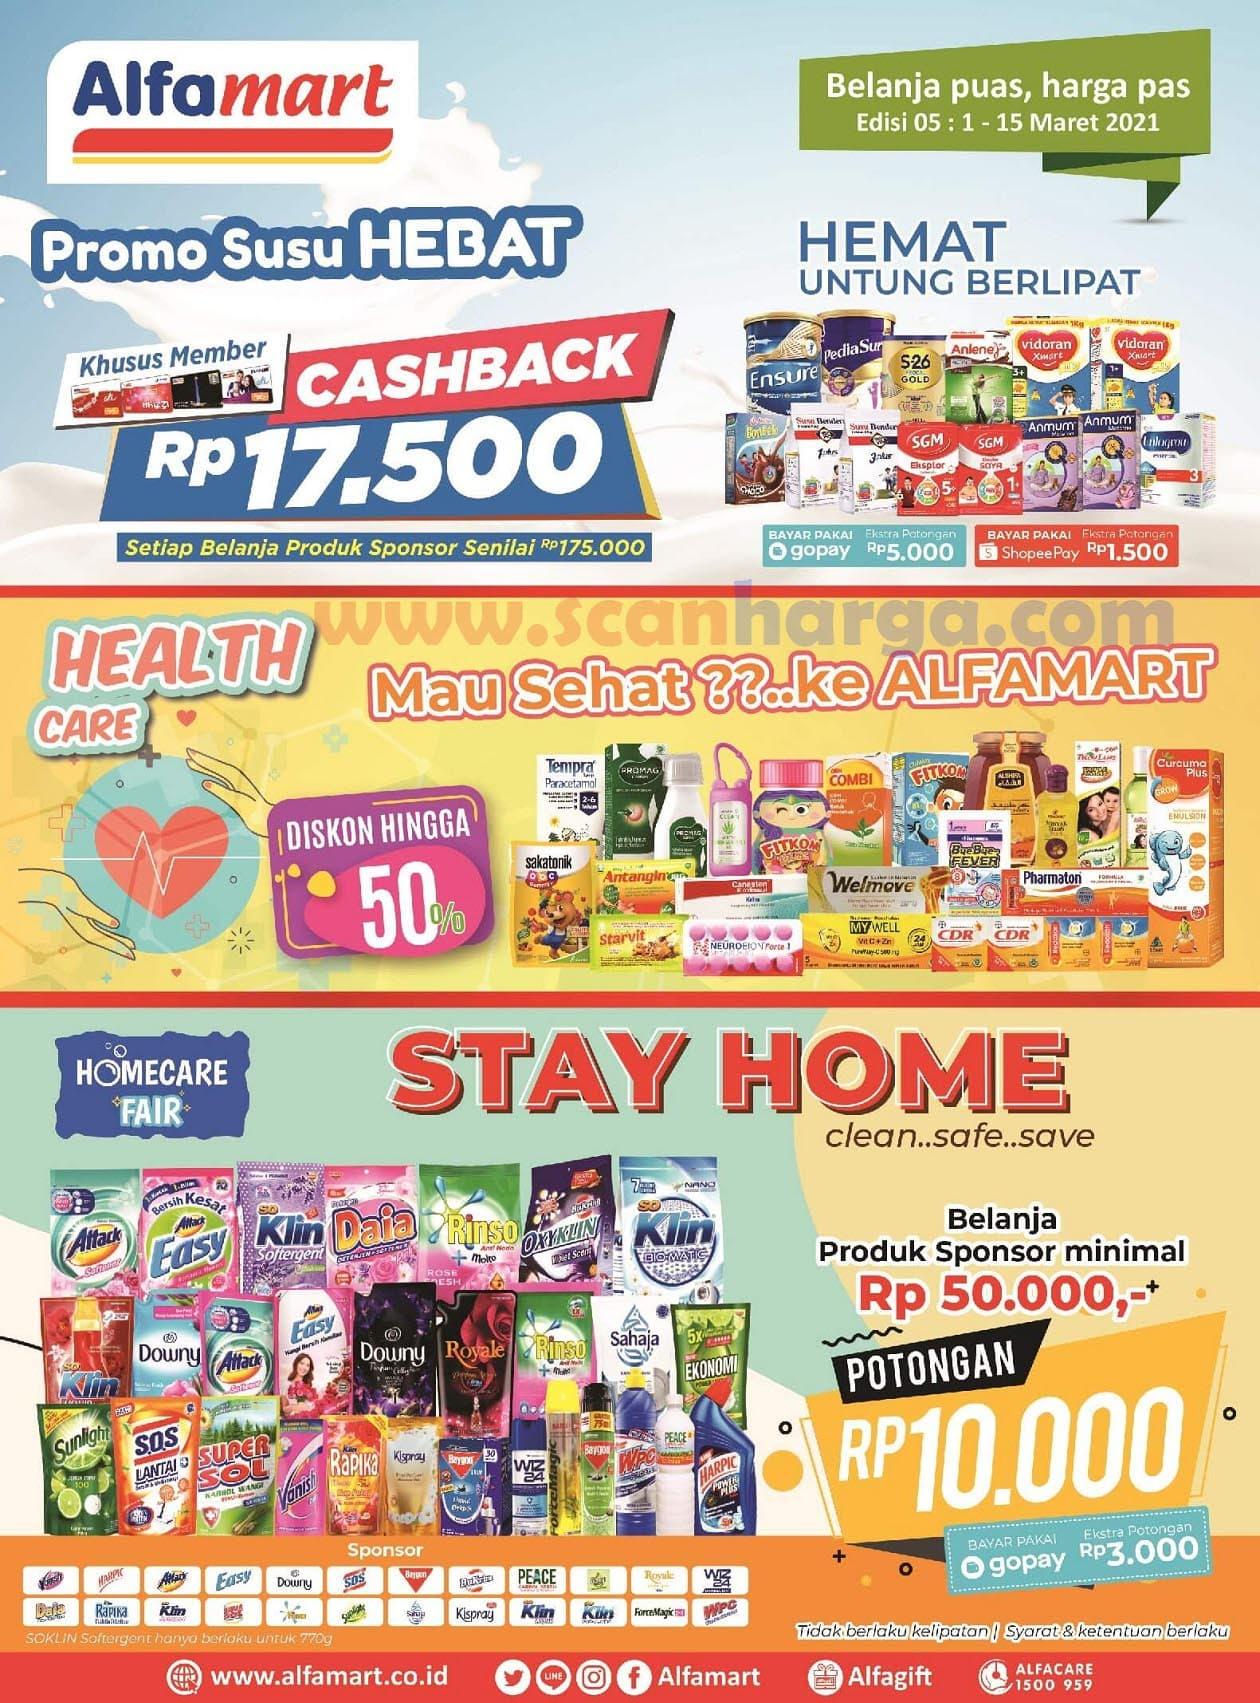 Katalog Promo Alfamart 1 - 15 Maret 2021 1